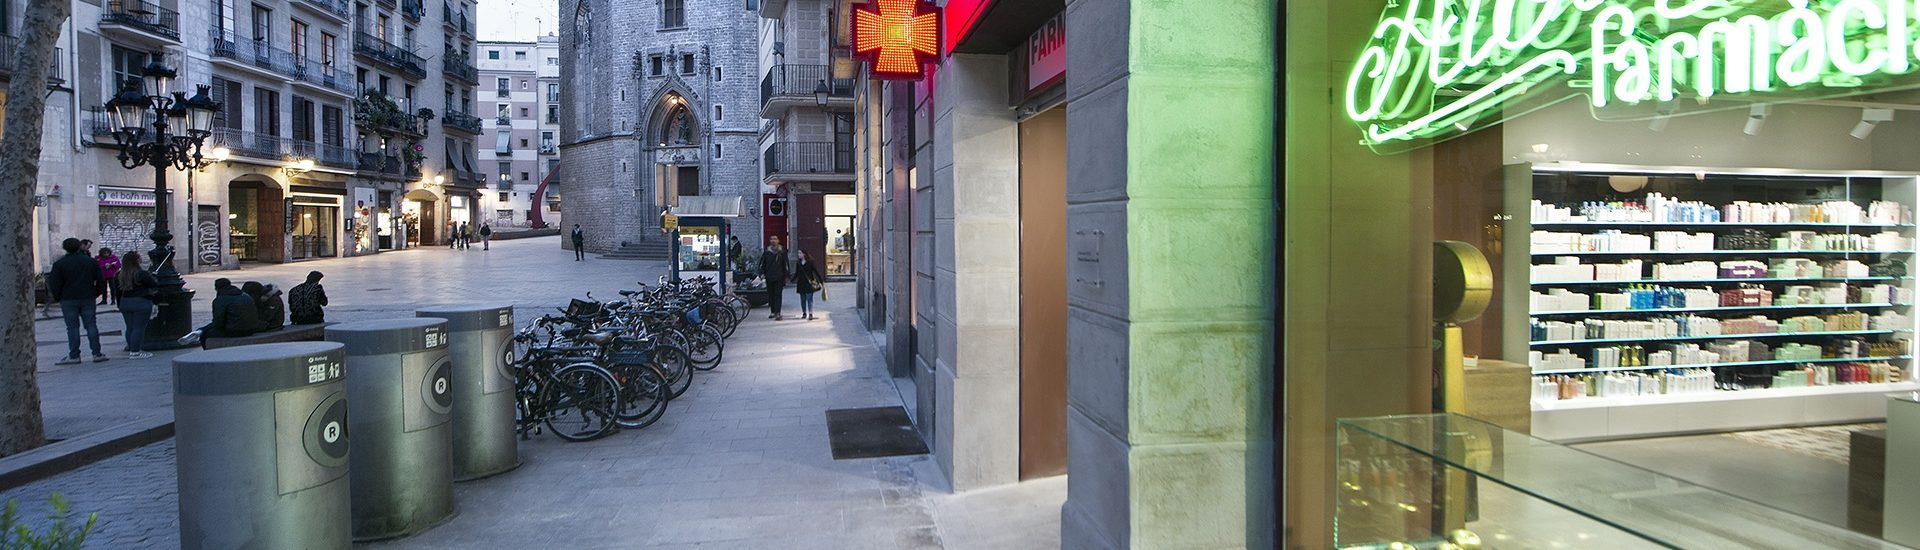 Farmacia Alomar en Barcelona